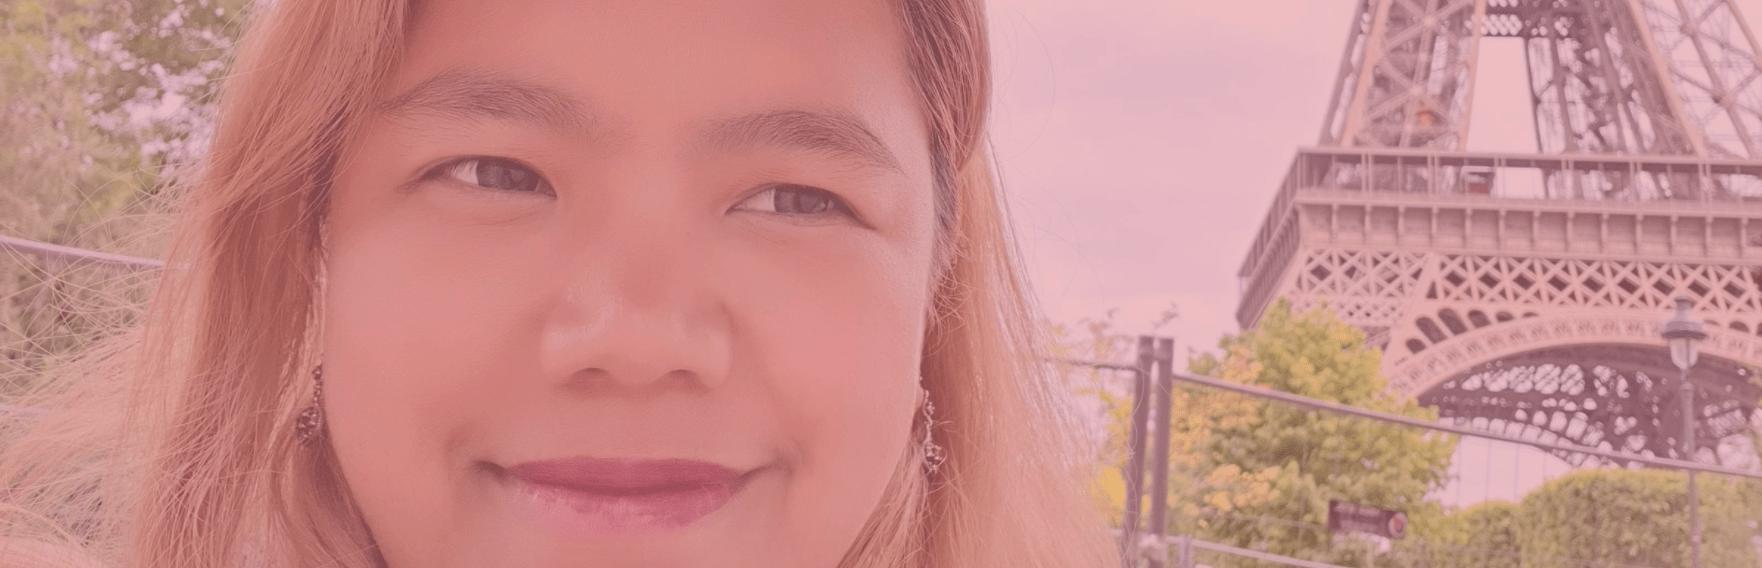 Geline CSM Rydoo Manila